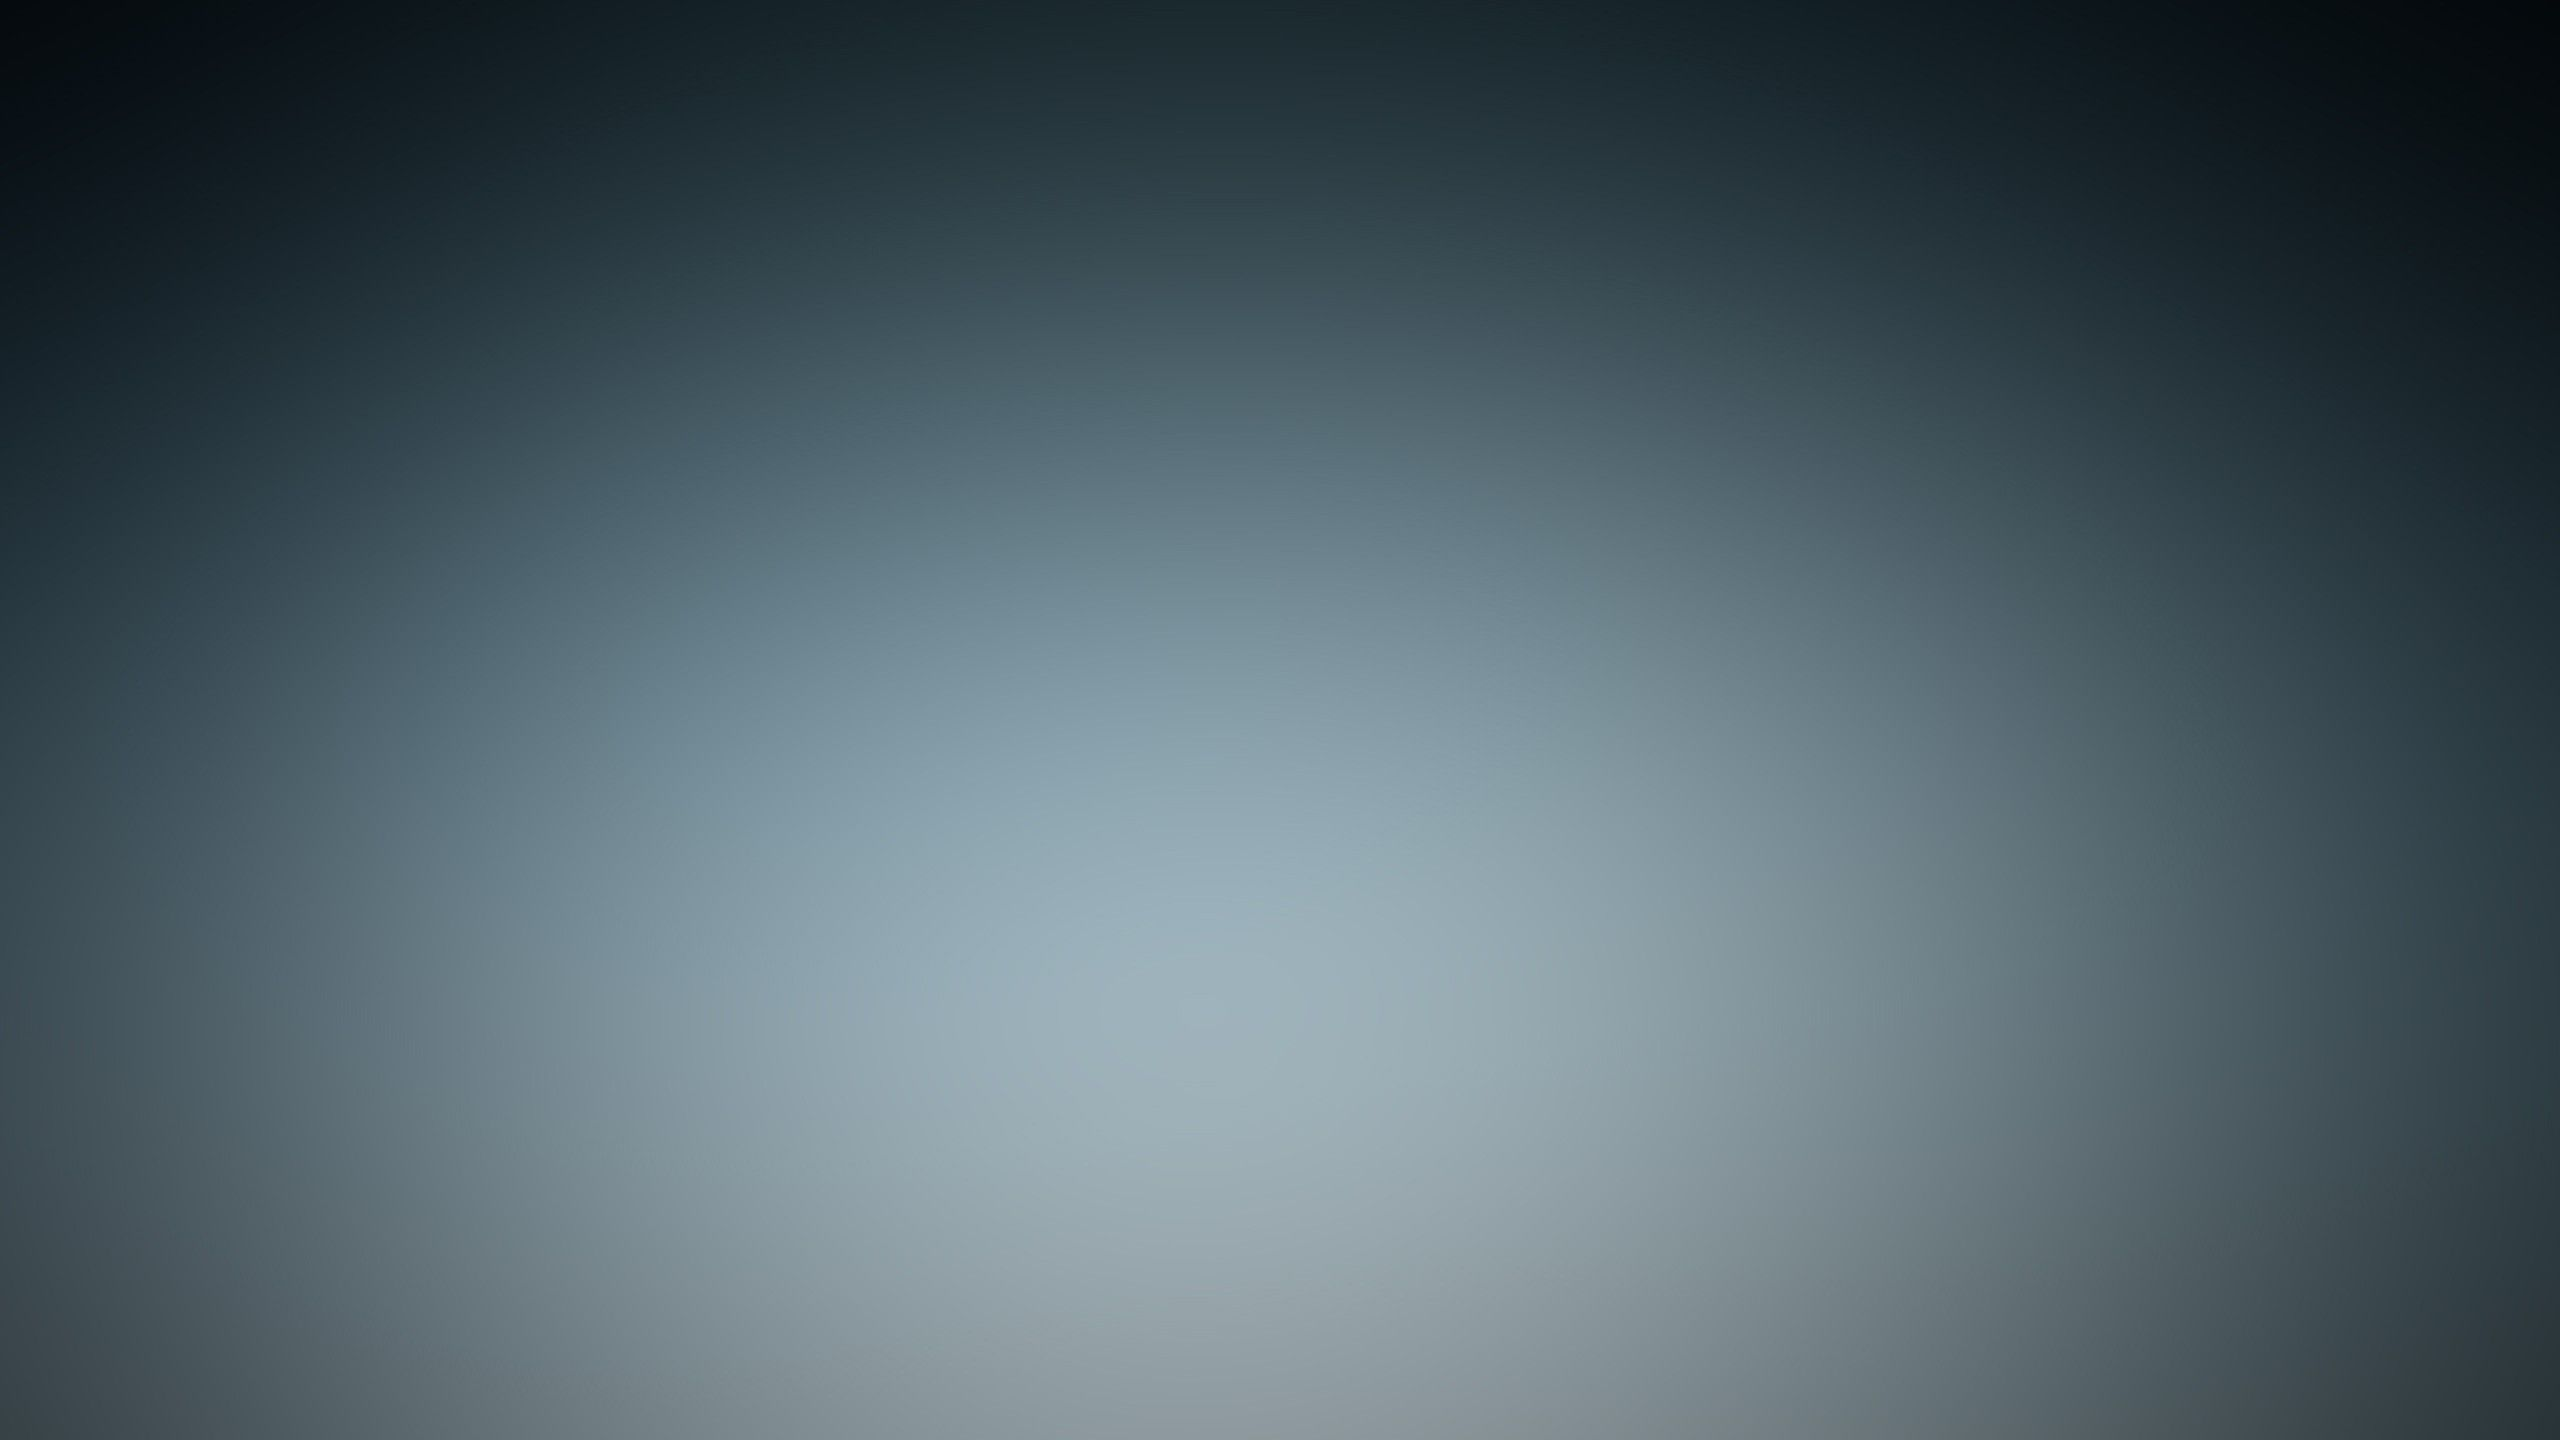 Simple Background Wallpaper 2991395 Wallbase Cc Grey